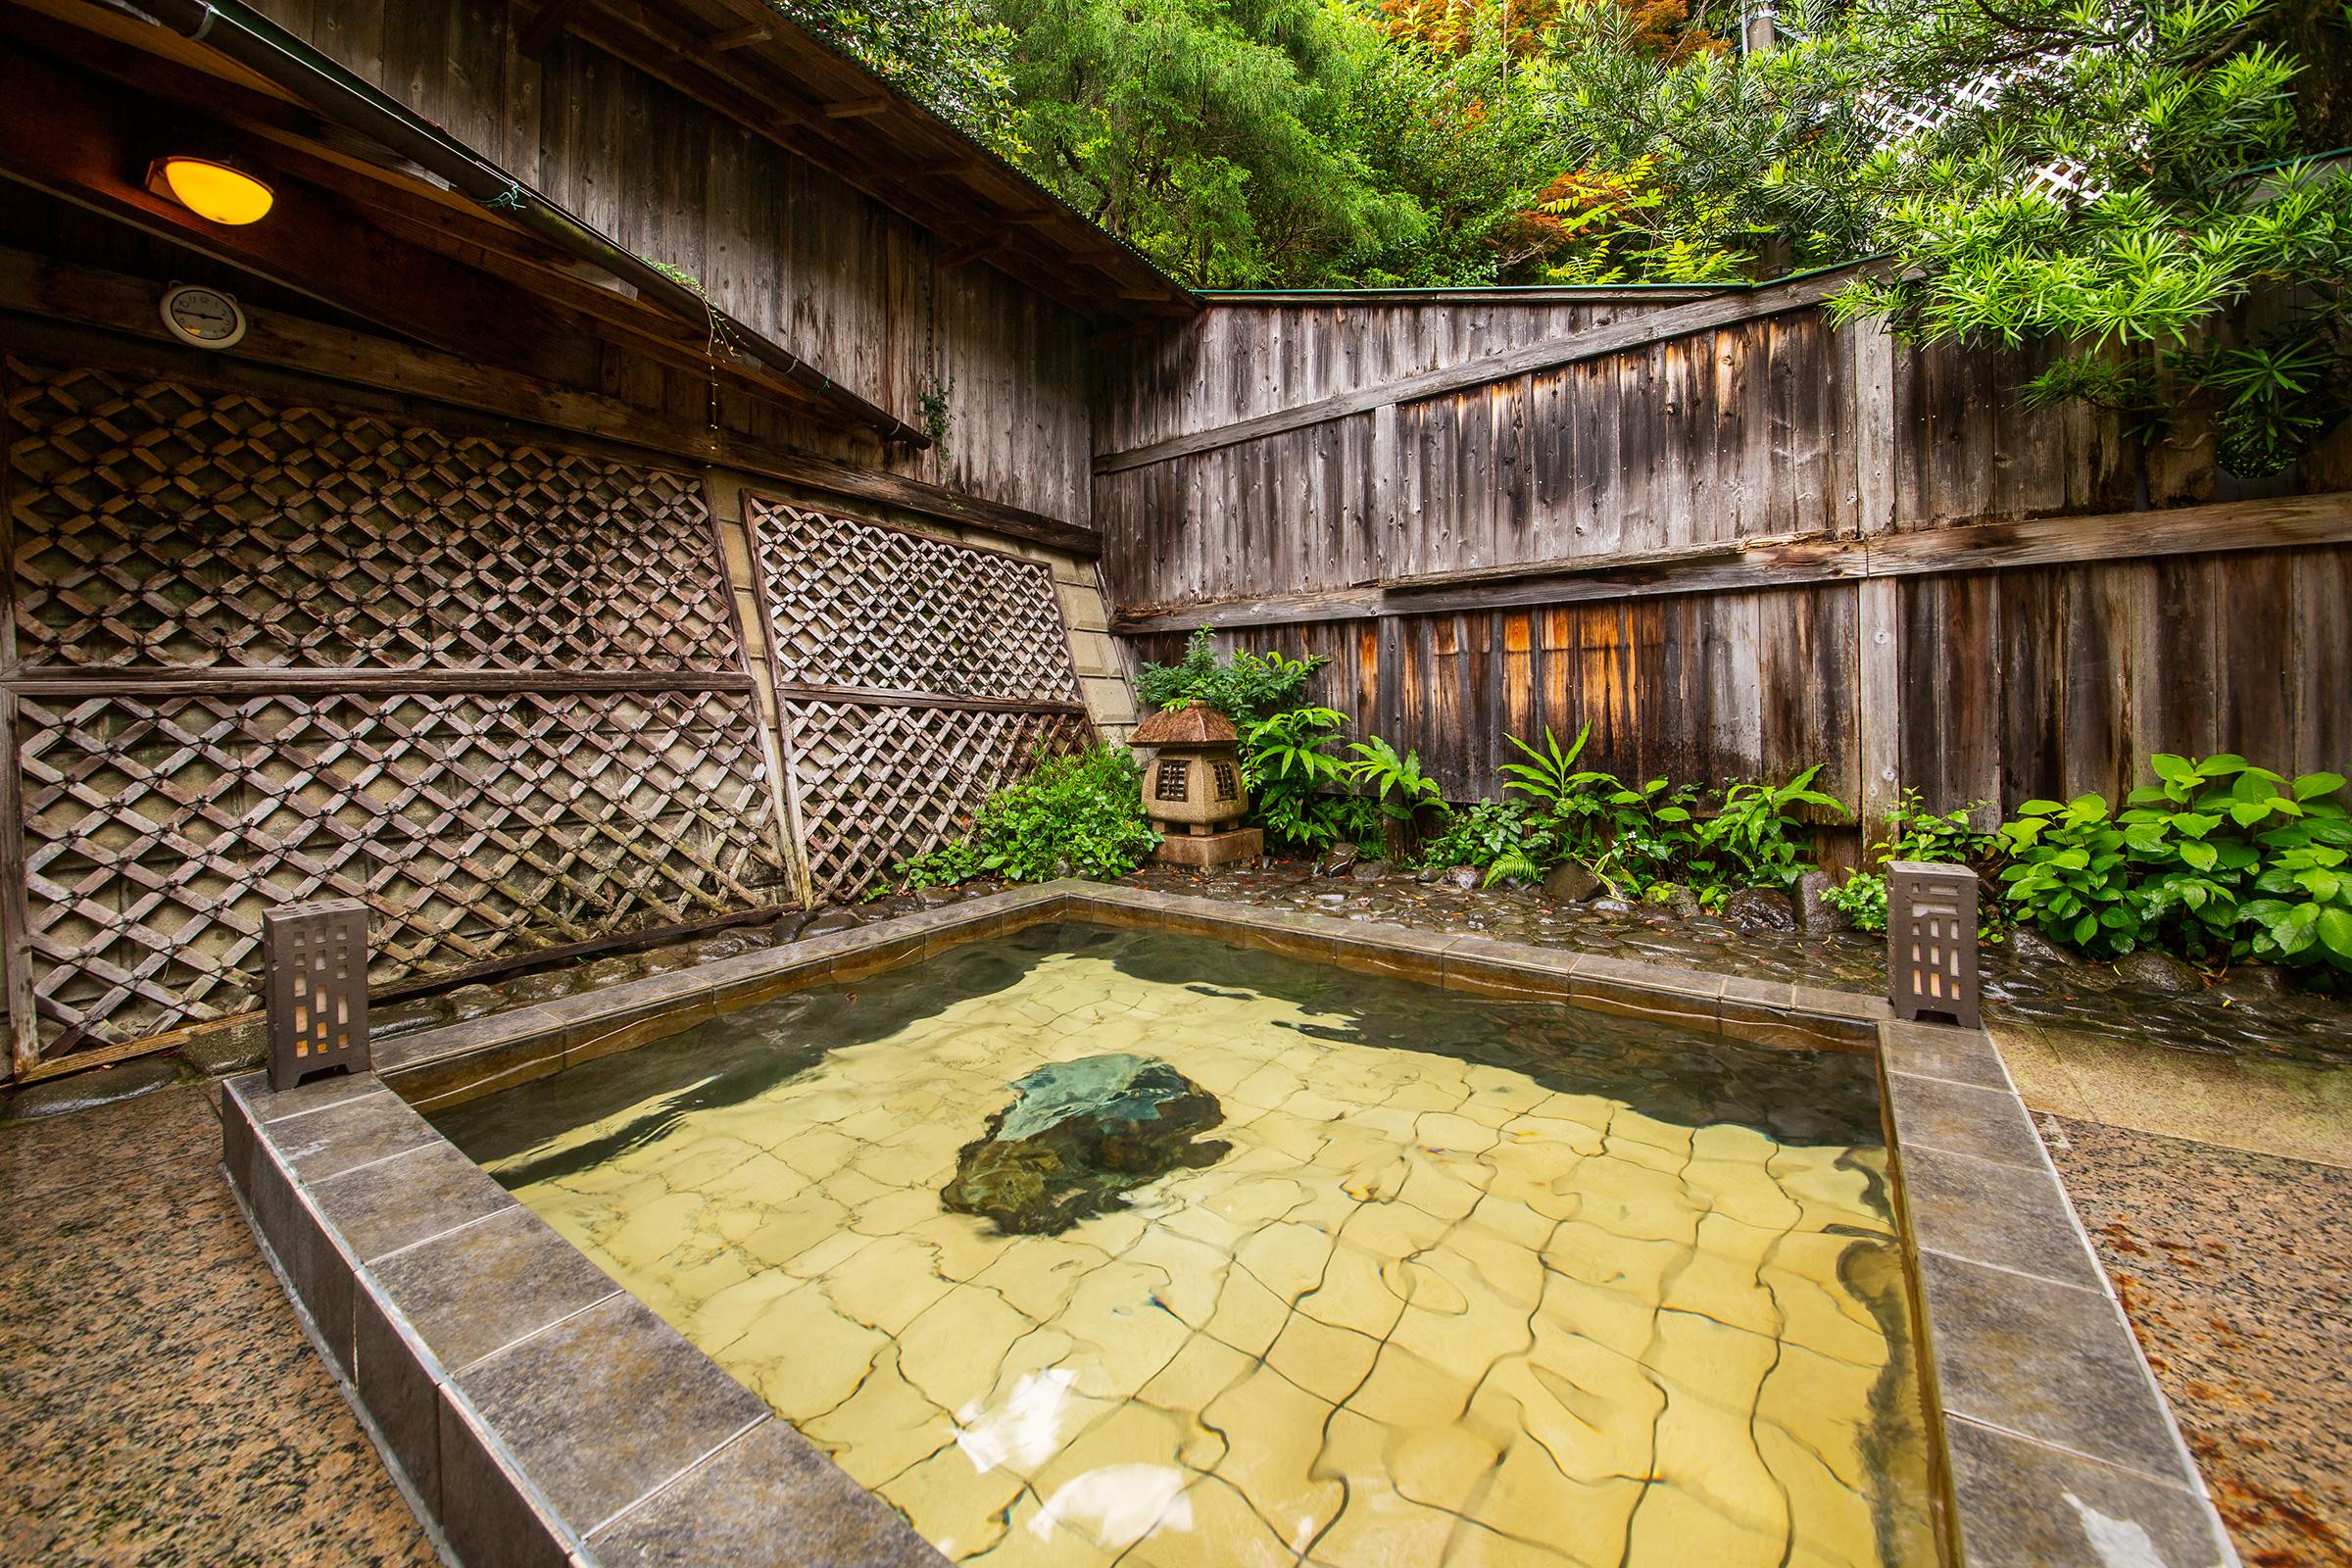 美人の湯「七沢温泉」